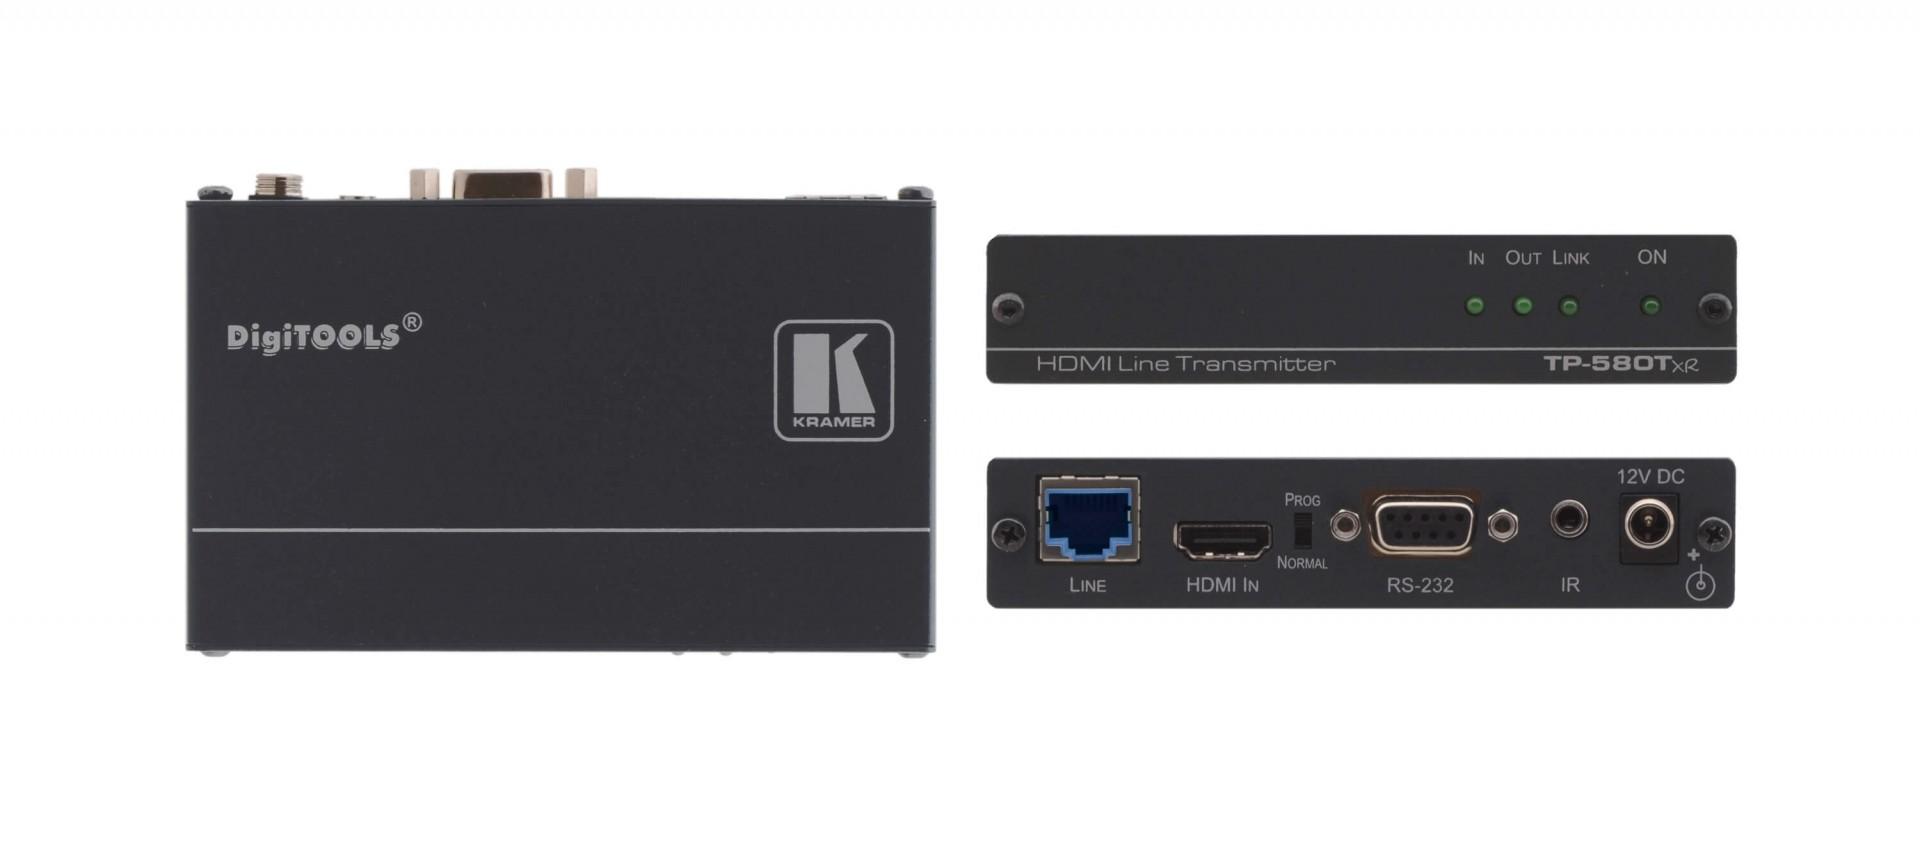 Kramer TP-580Txr - 4K60 4:2:0 HDMI HDCP 2.2 Transmitter